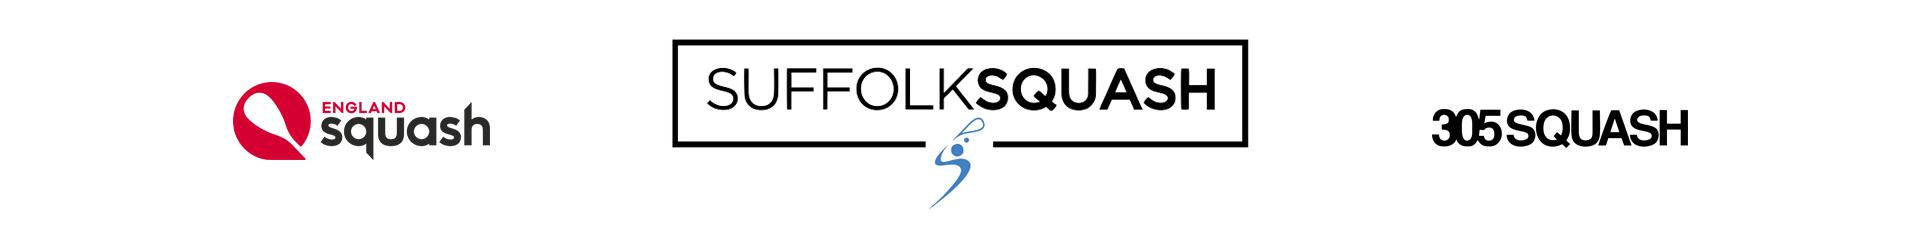 Suffolk Squash